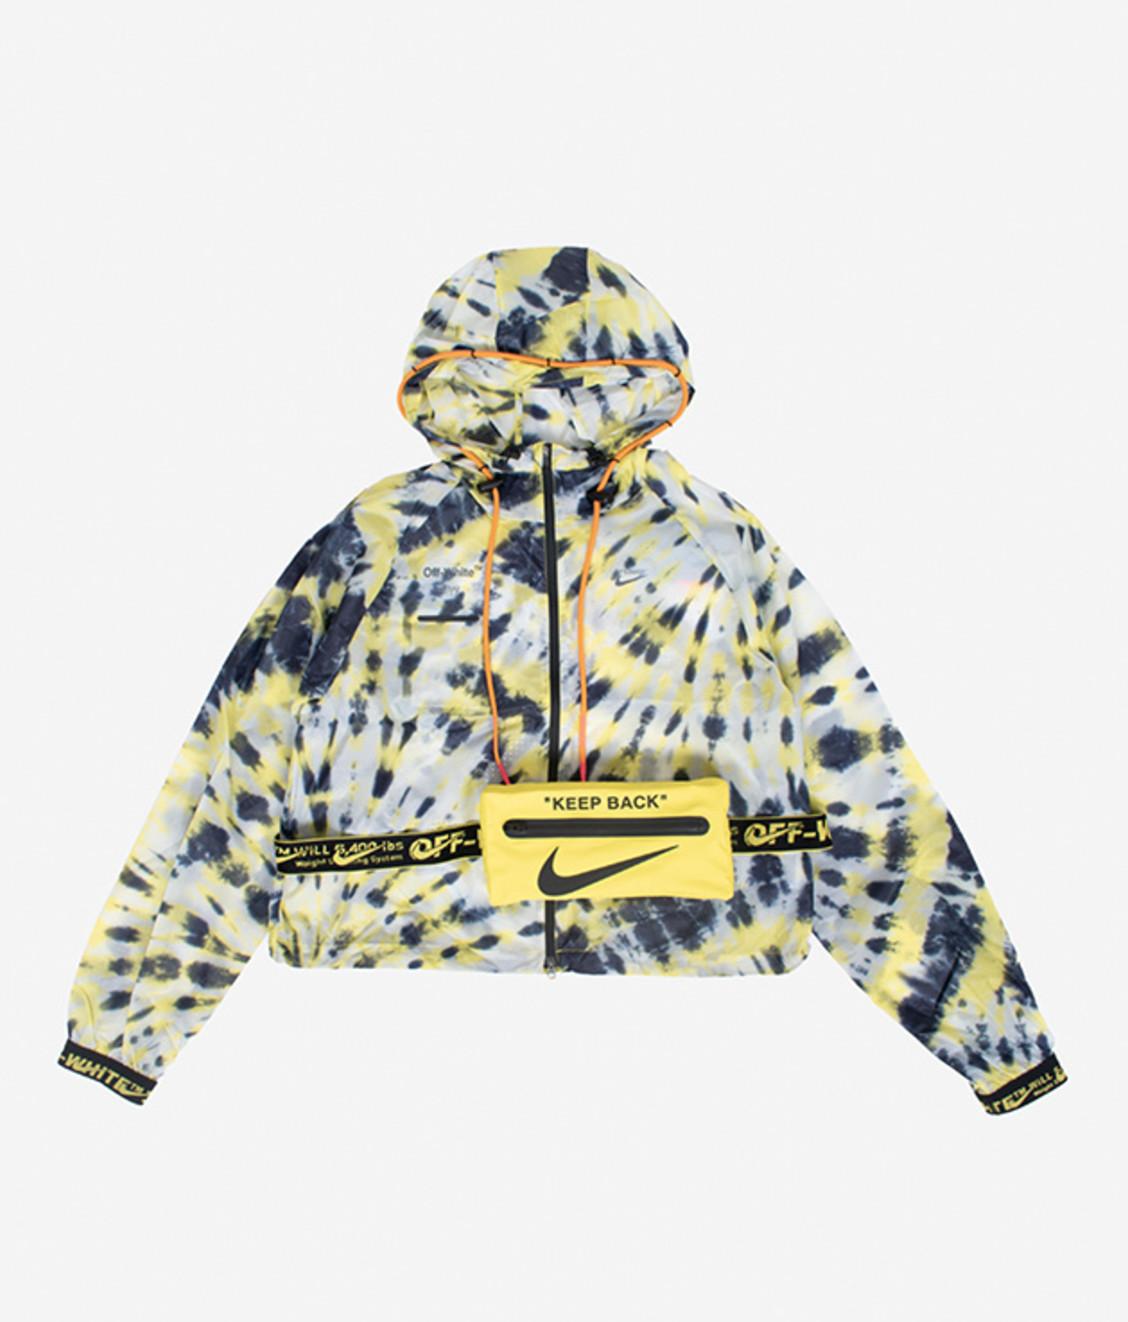 Nike Nike Off White NRG Jacket Tye Dye Volt #1